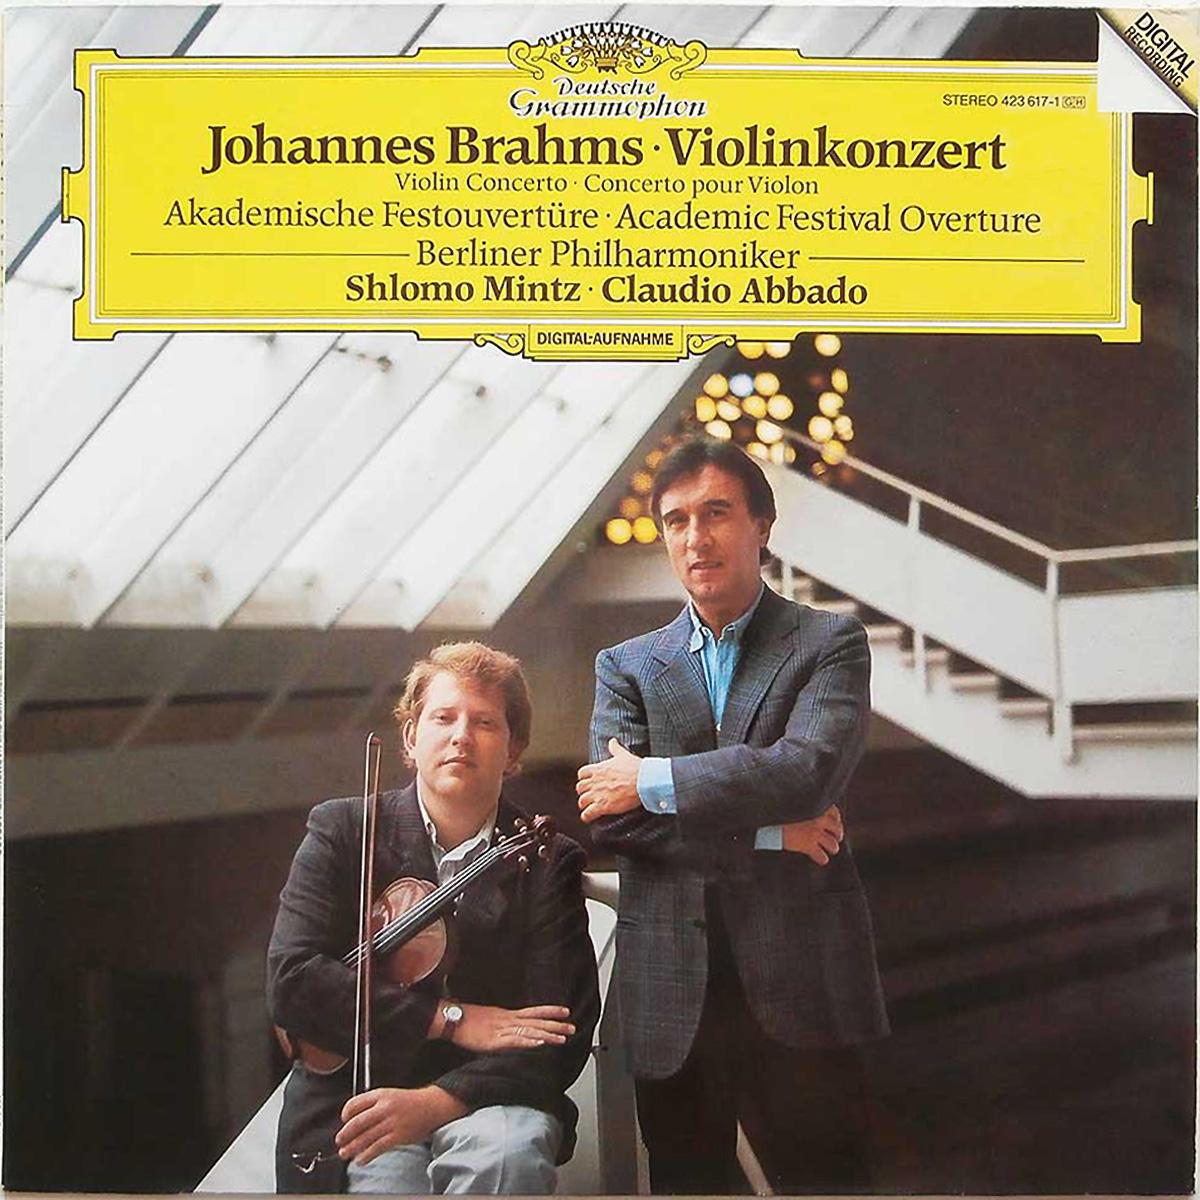 DGG 423 617 Brahms Concerto Violon Akademische Festouvertüre Abbado DGG Digital Aufnahme